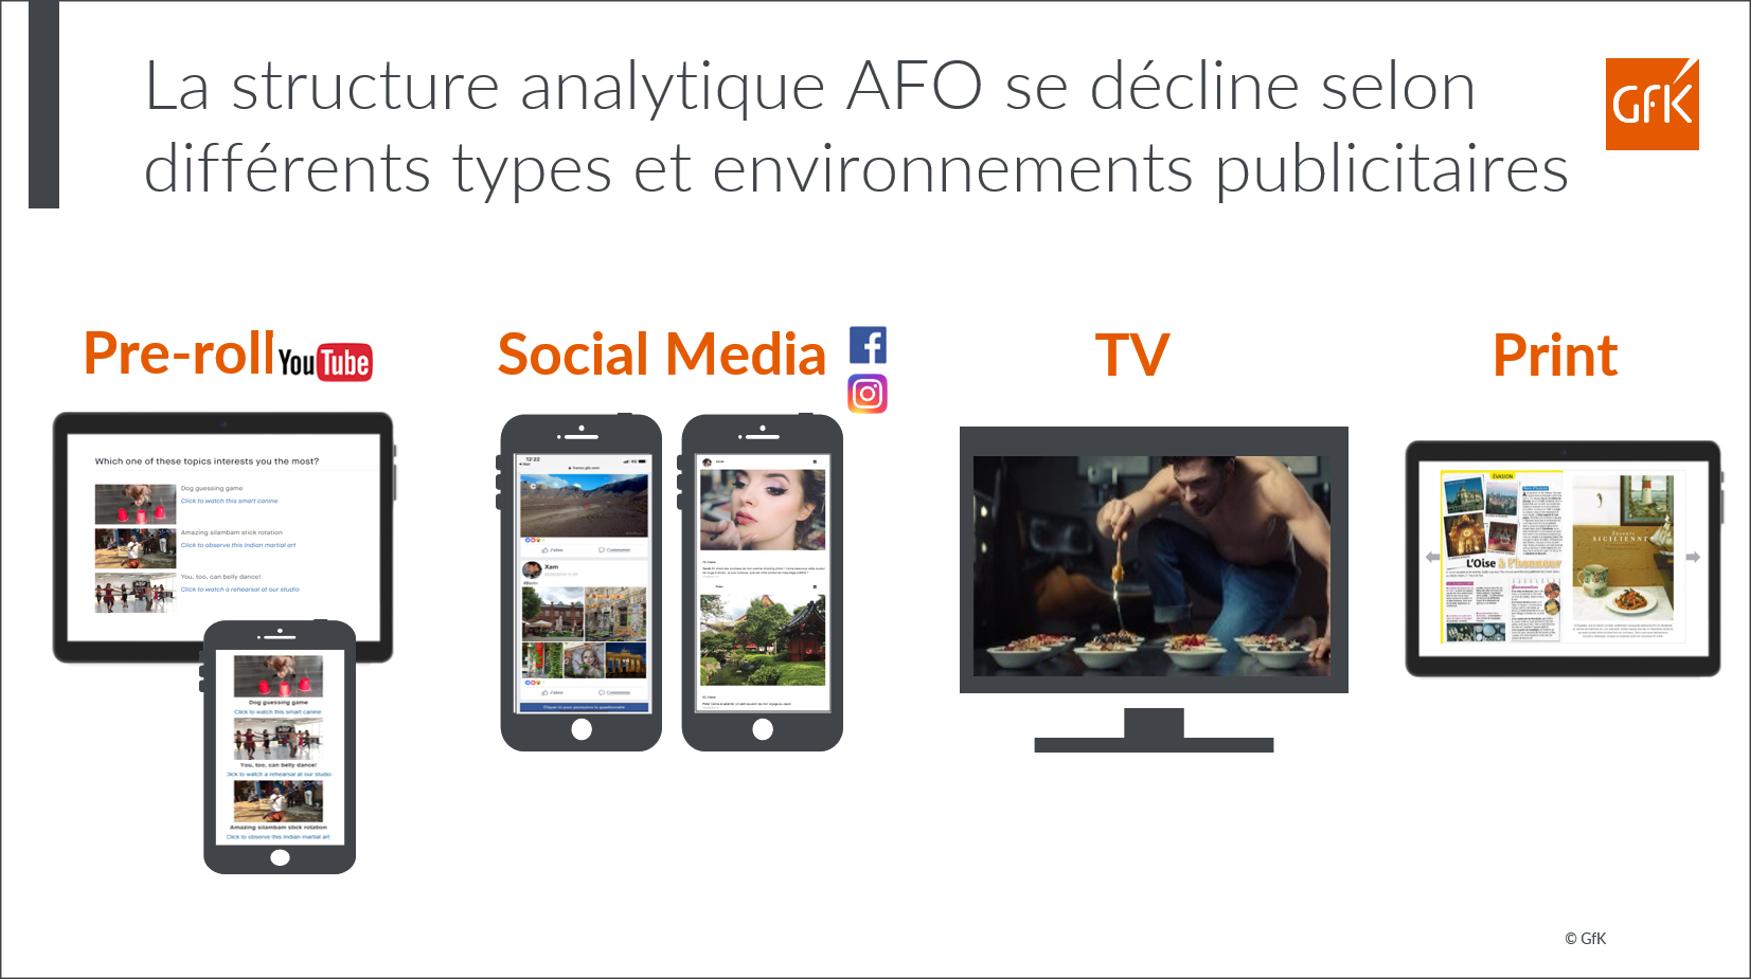 GfK_AFO_media-scope